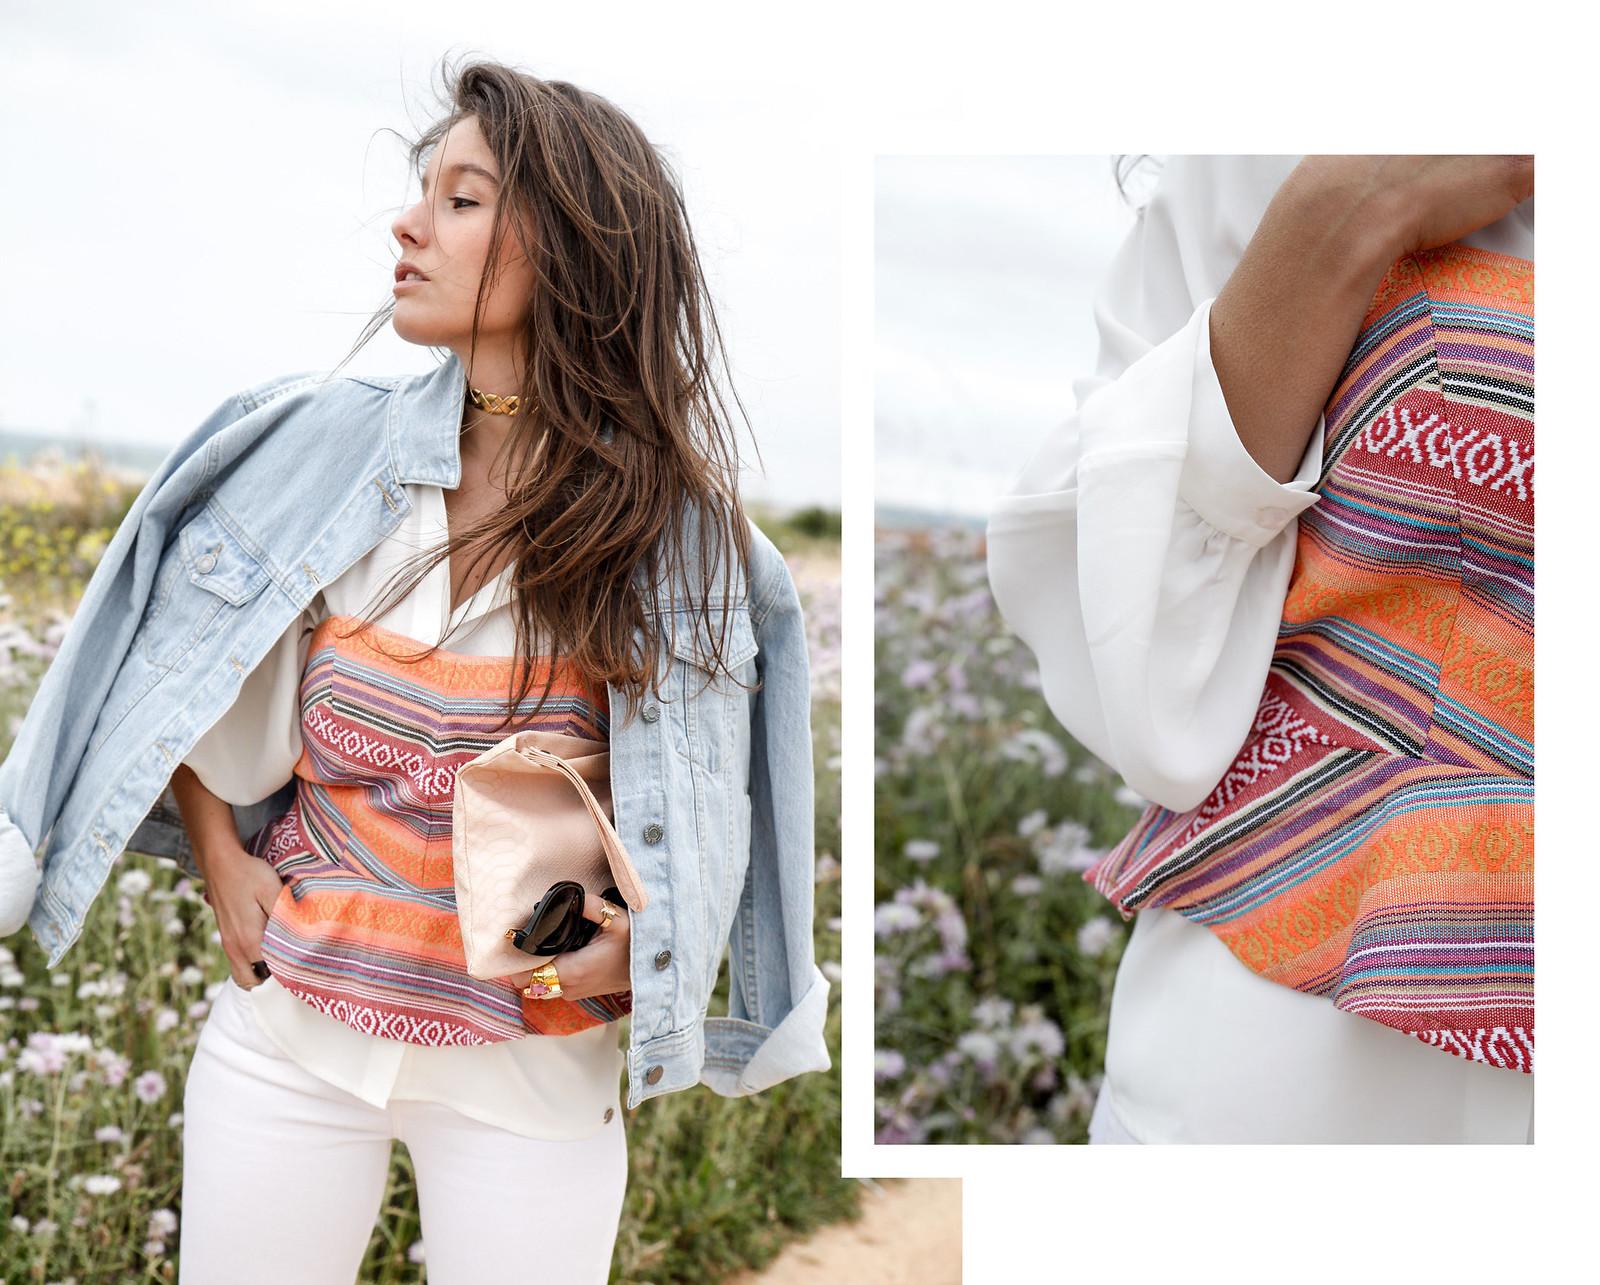 016_corset_etnico_danity_paris_theguestgirl_influencer_barcelona_laura_santolaria